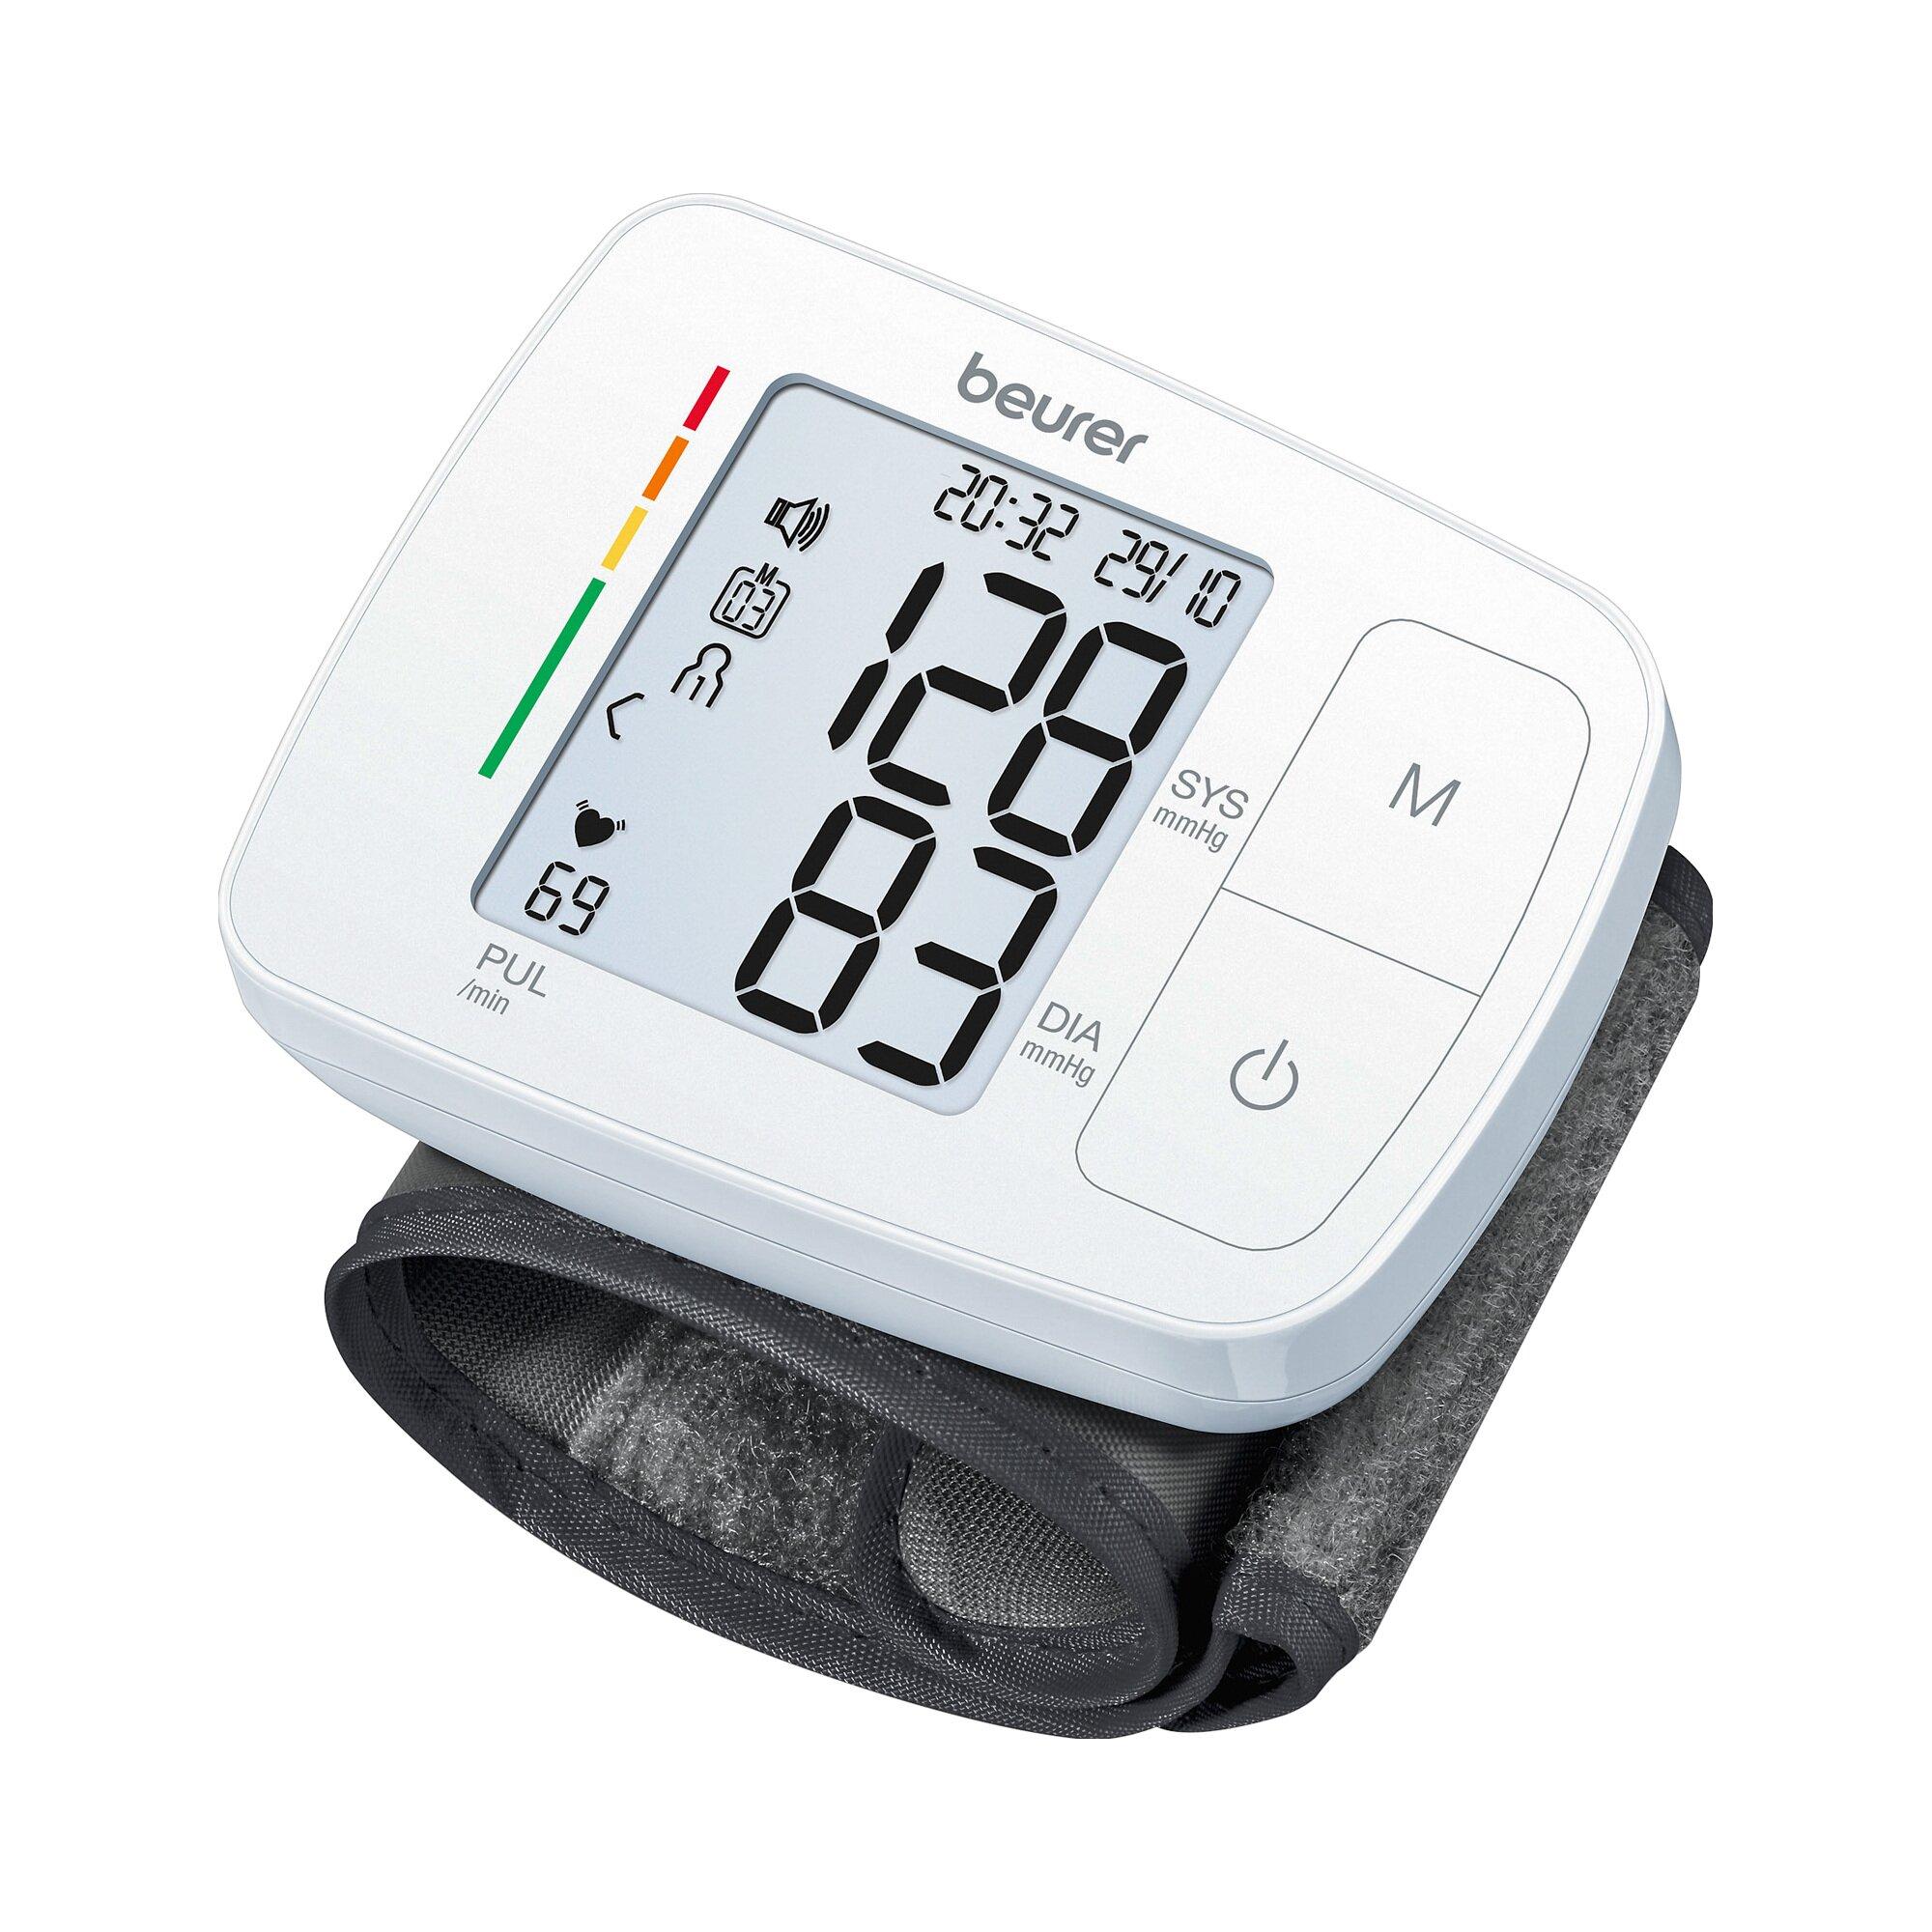 Image of Beurer Sprechendes Blutdruckmessgerät